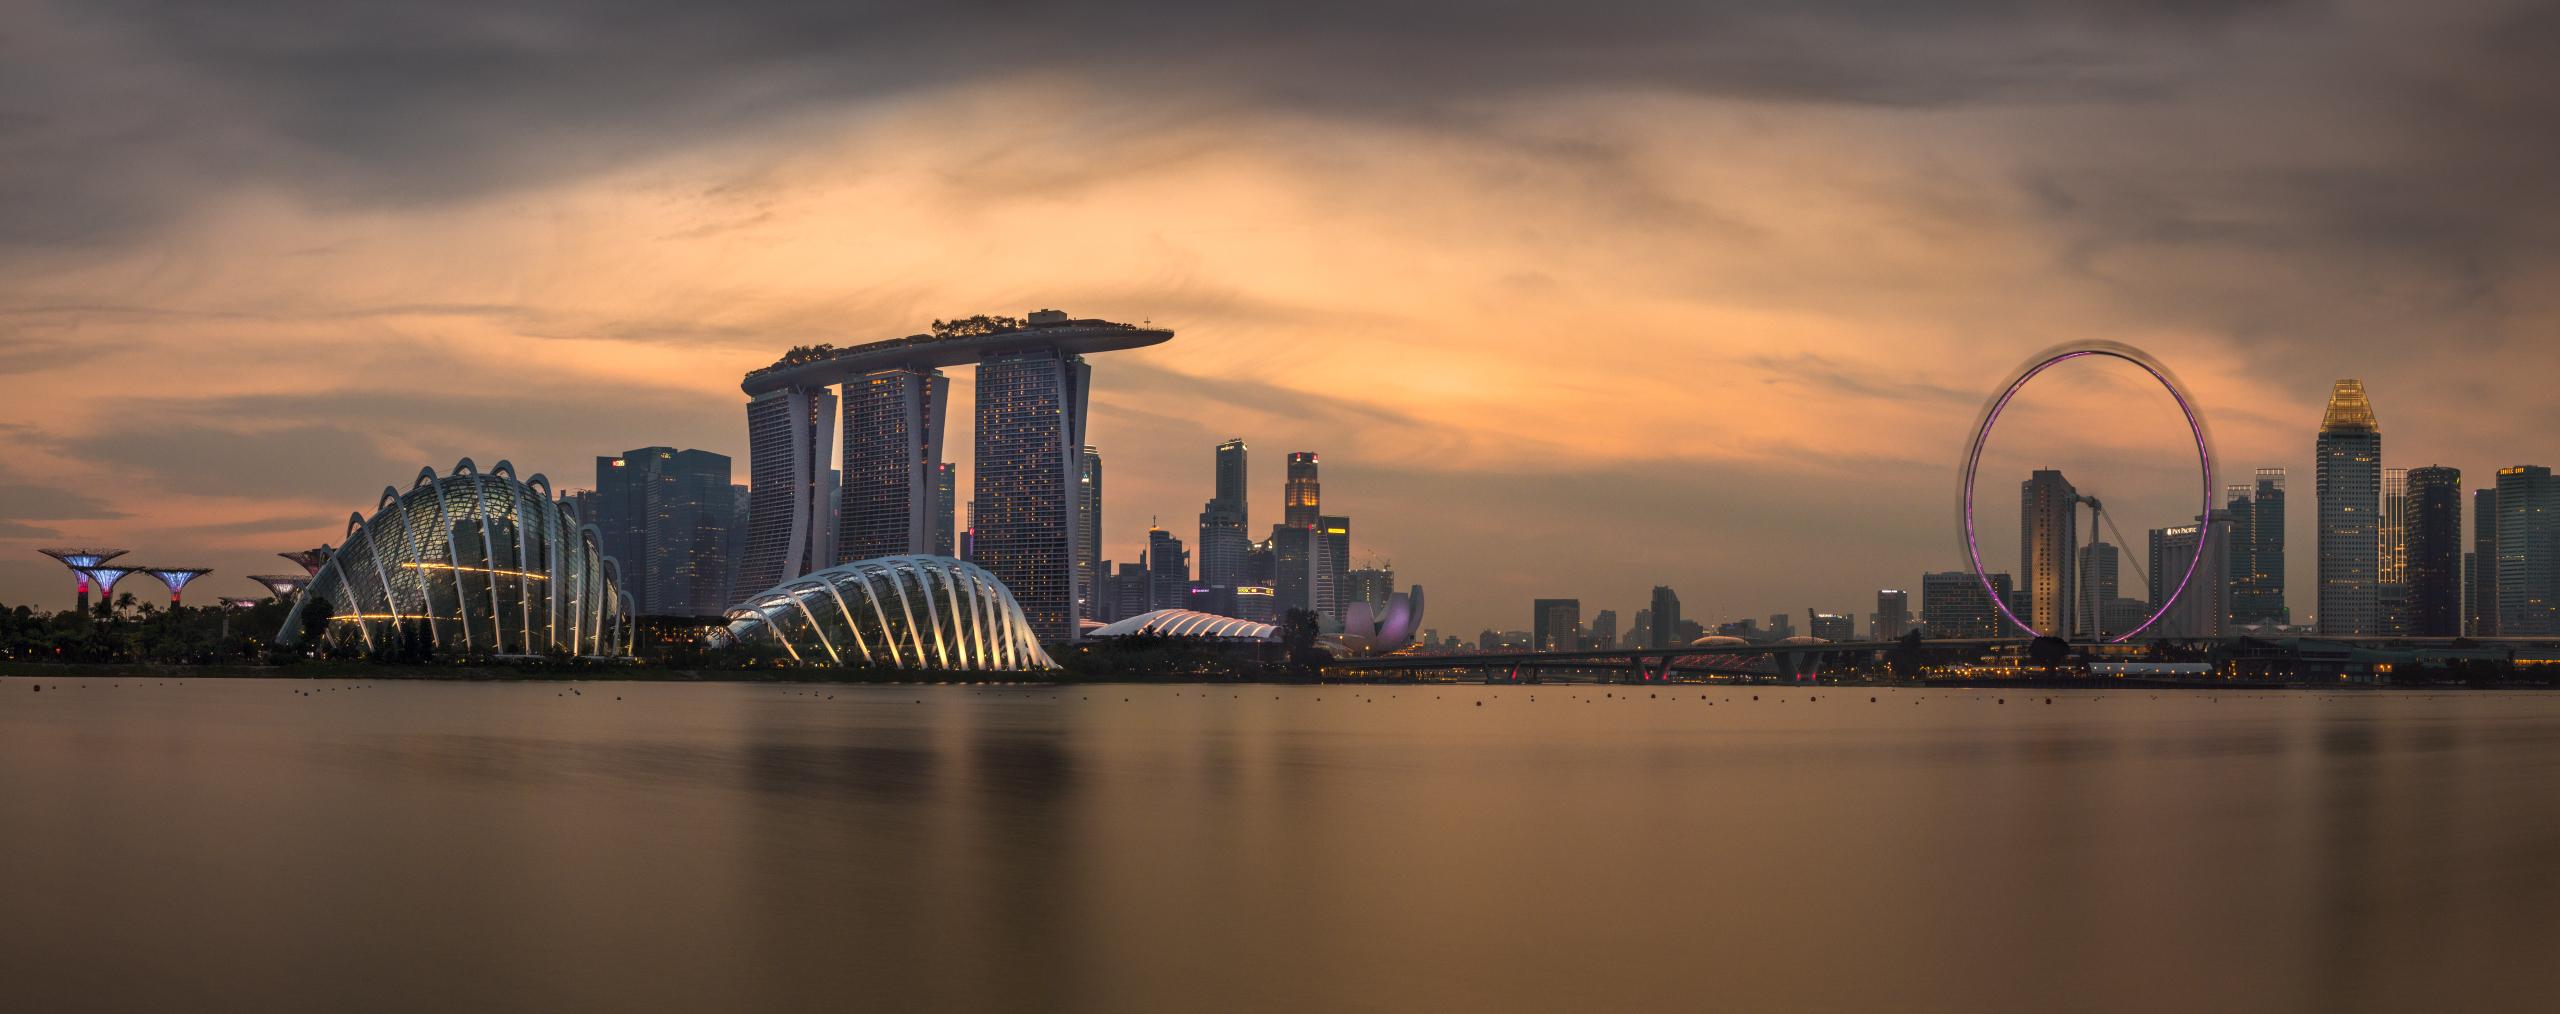 Wallpaper Singapore Landscape Building Cityscape Wide Angle